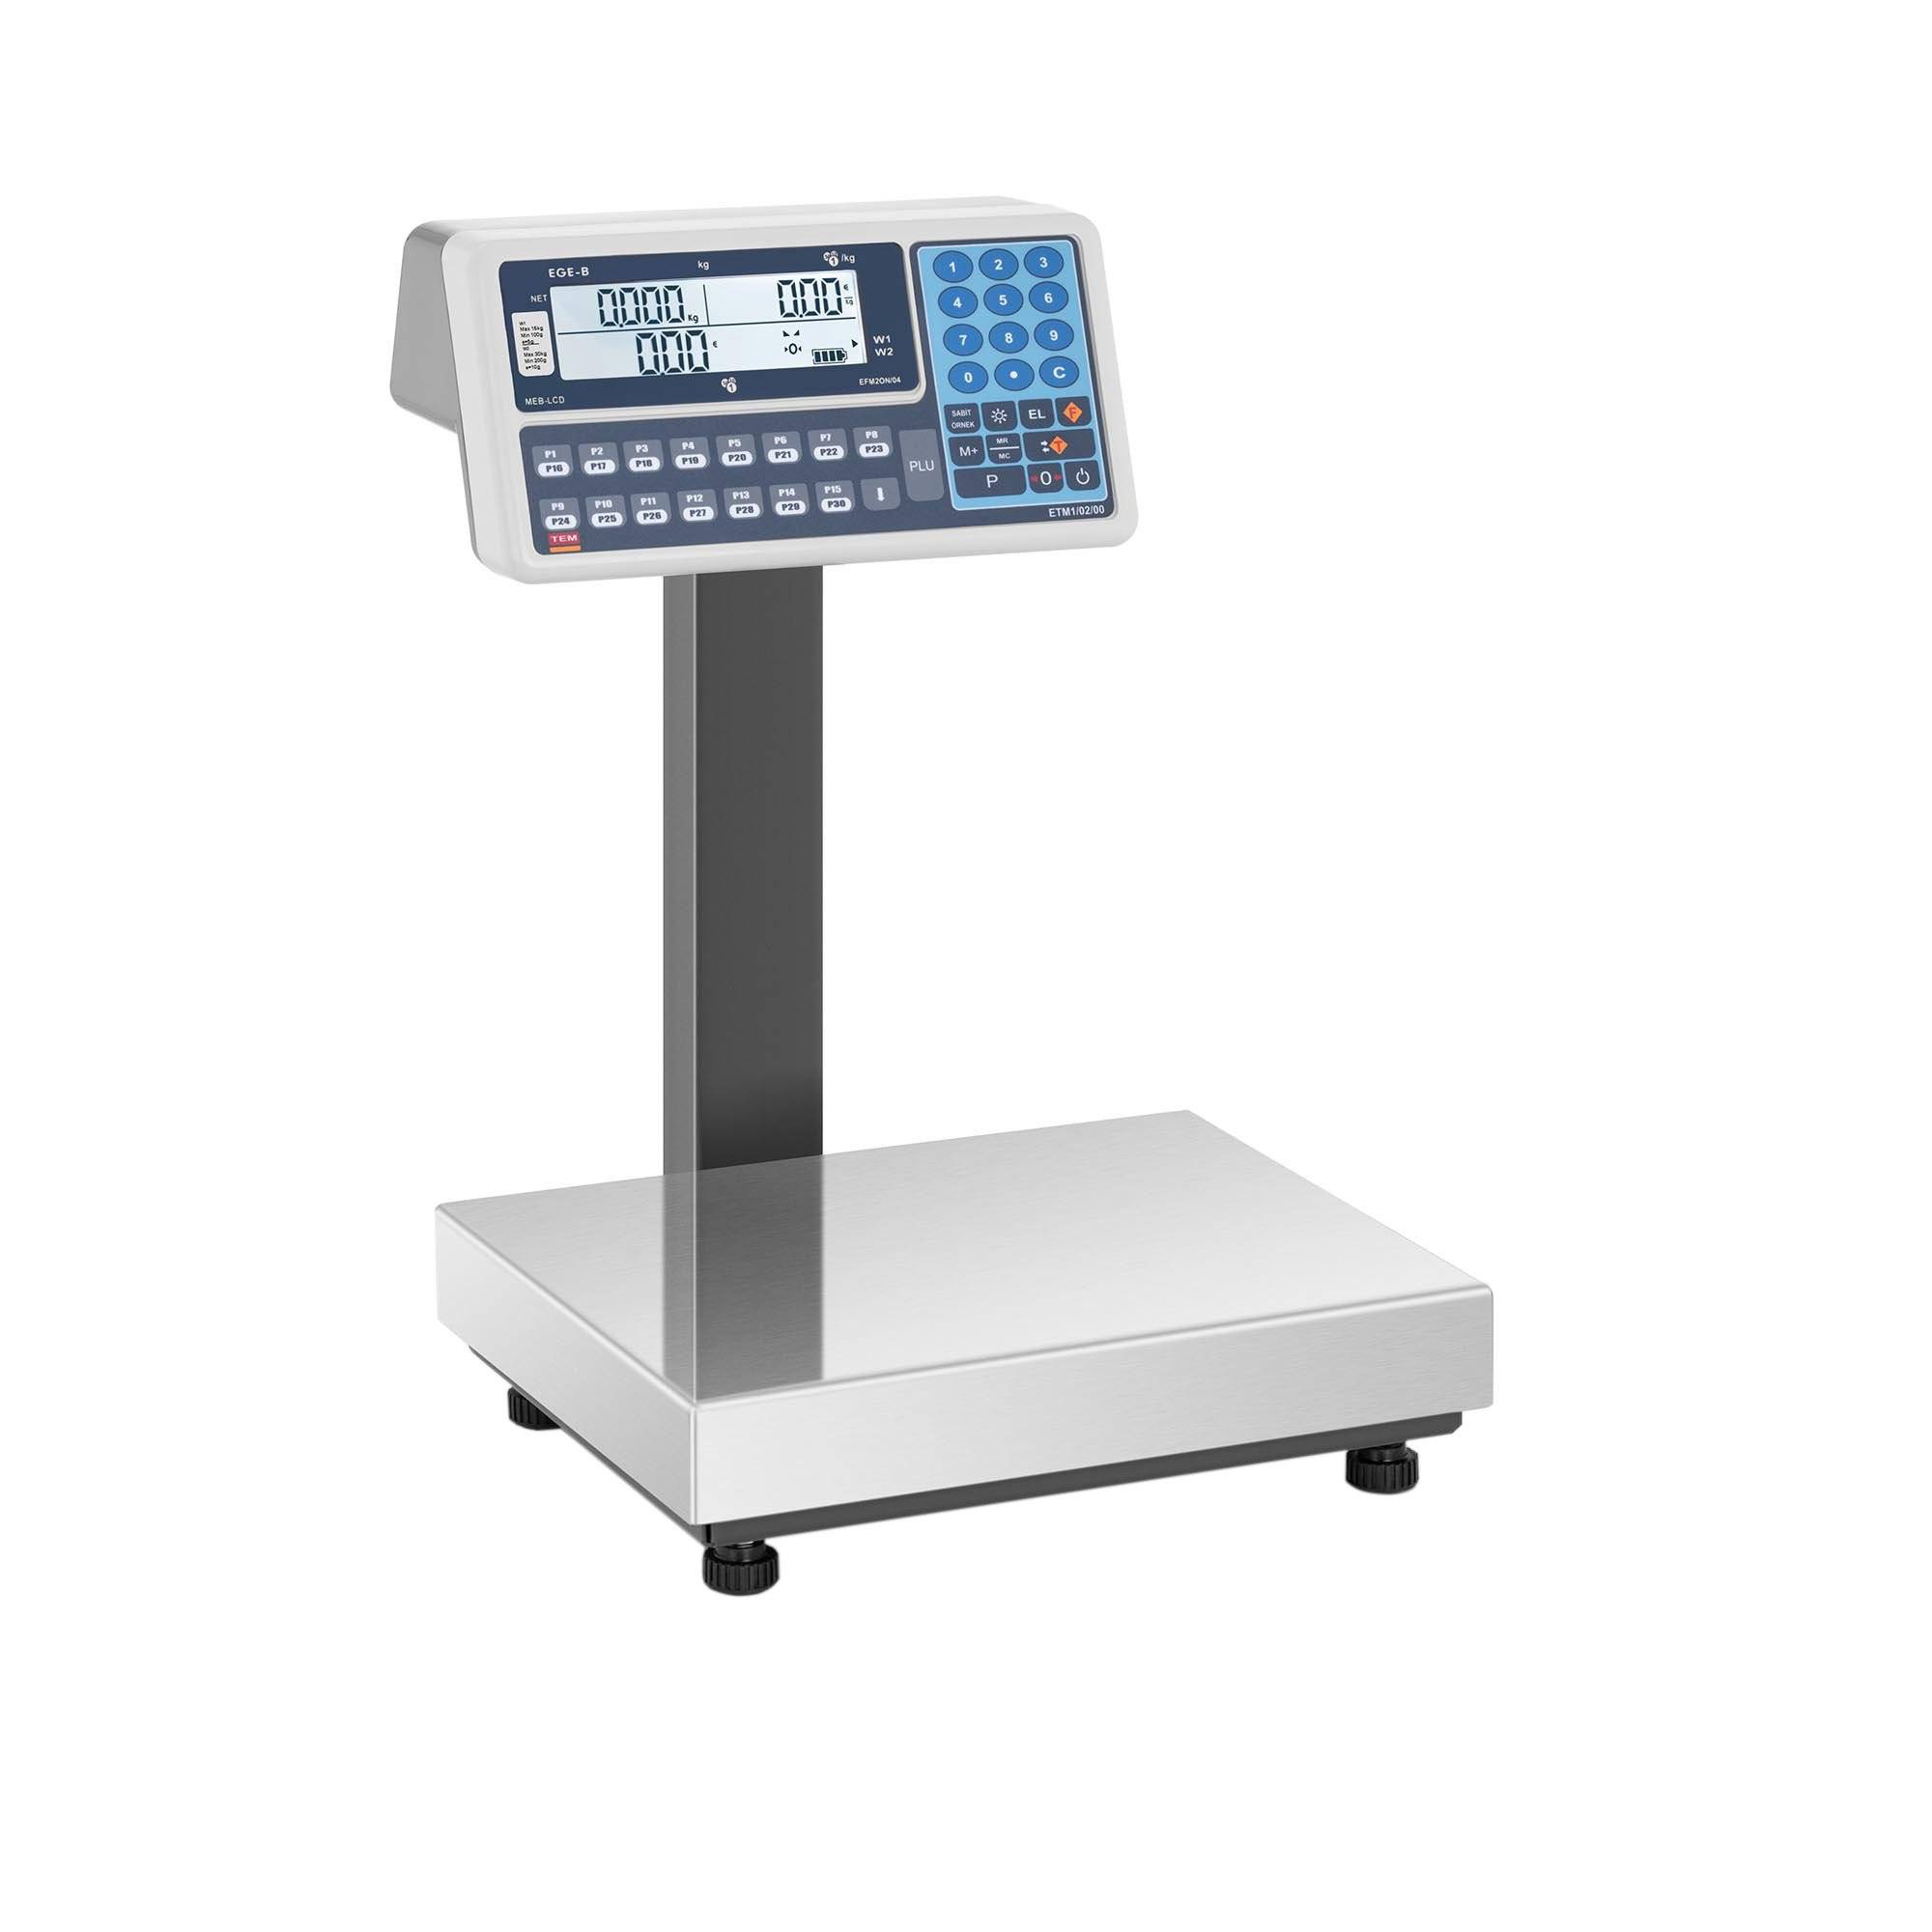 TEM Bilancia da banco prezzatrice - tarata - 30 kg - Duale LCD BE2TA028X035030-B1